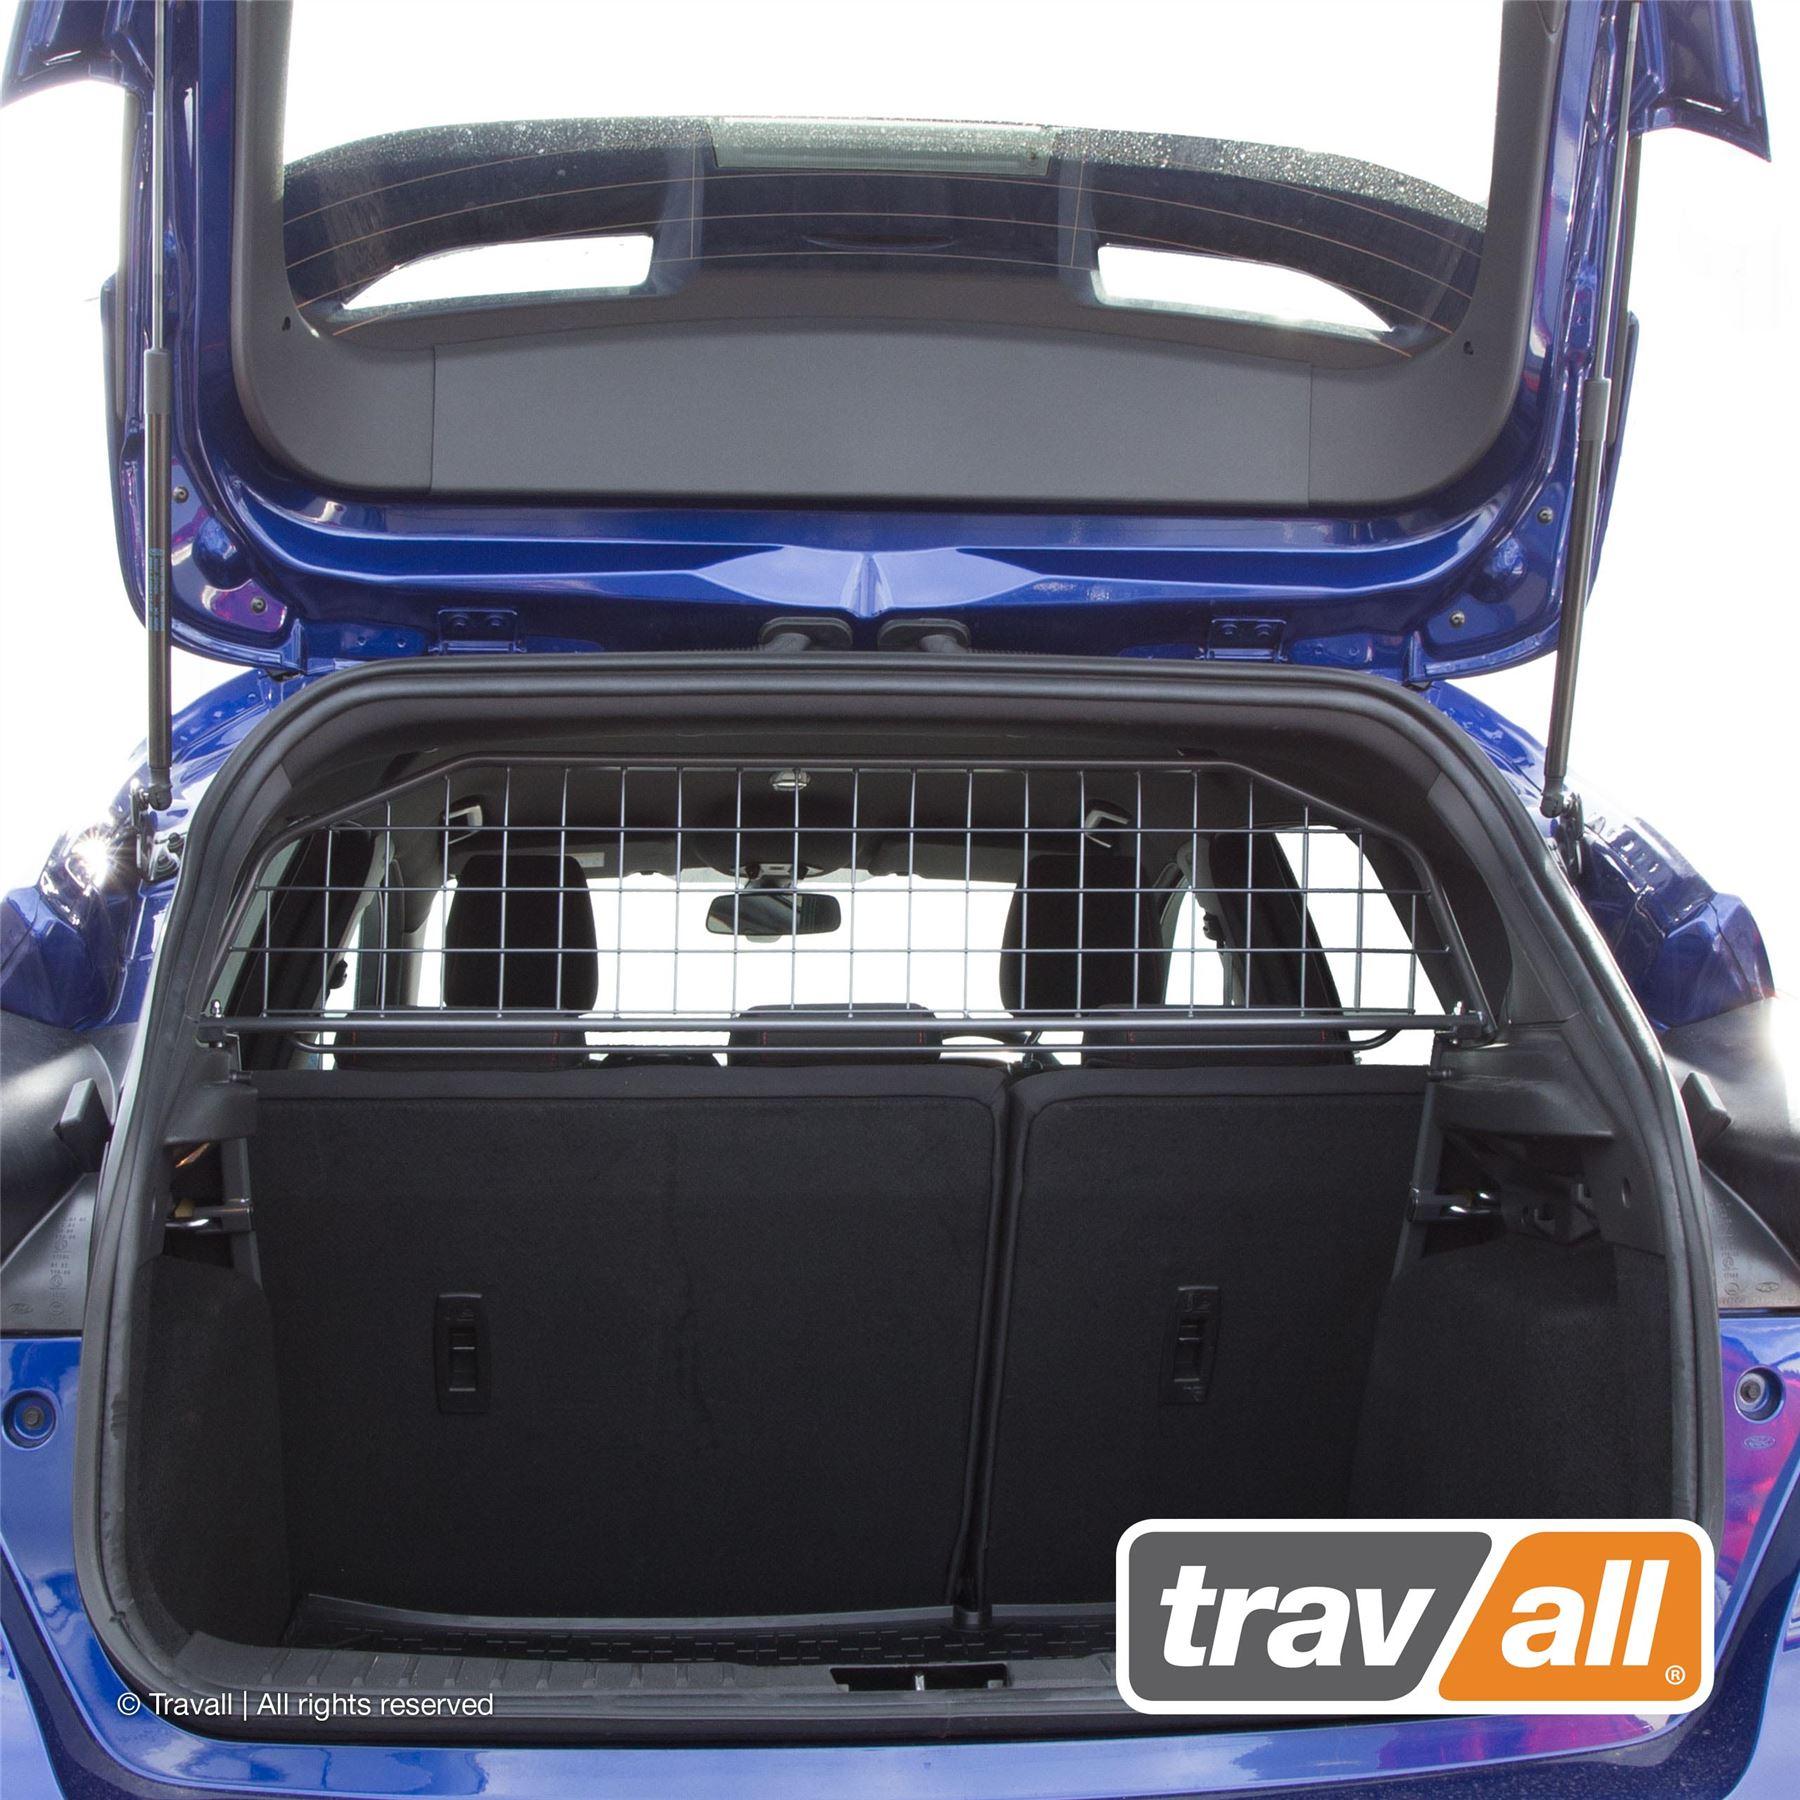 Details About Ford Focus 5 Door Hatchback Dog Guard 2010 18 Travall Guard Tdg1302